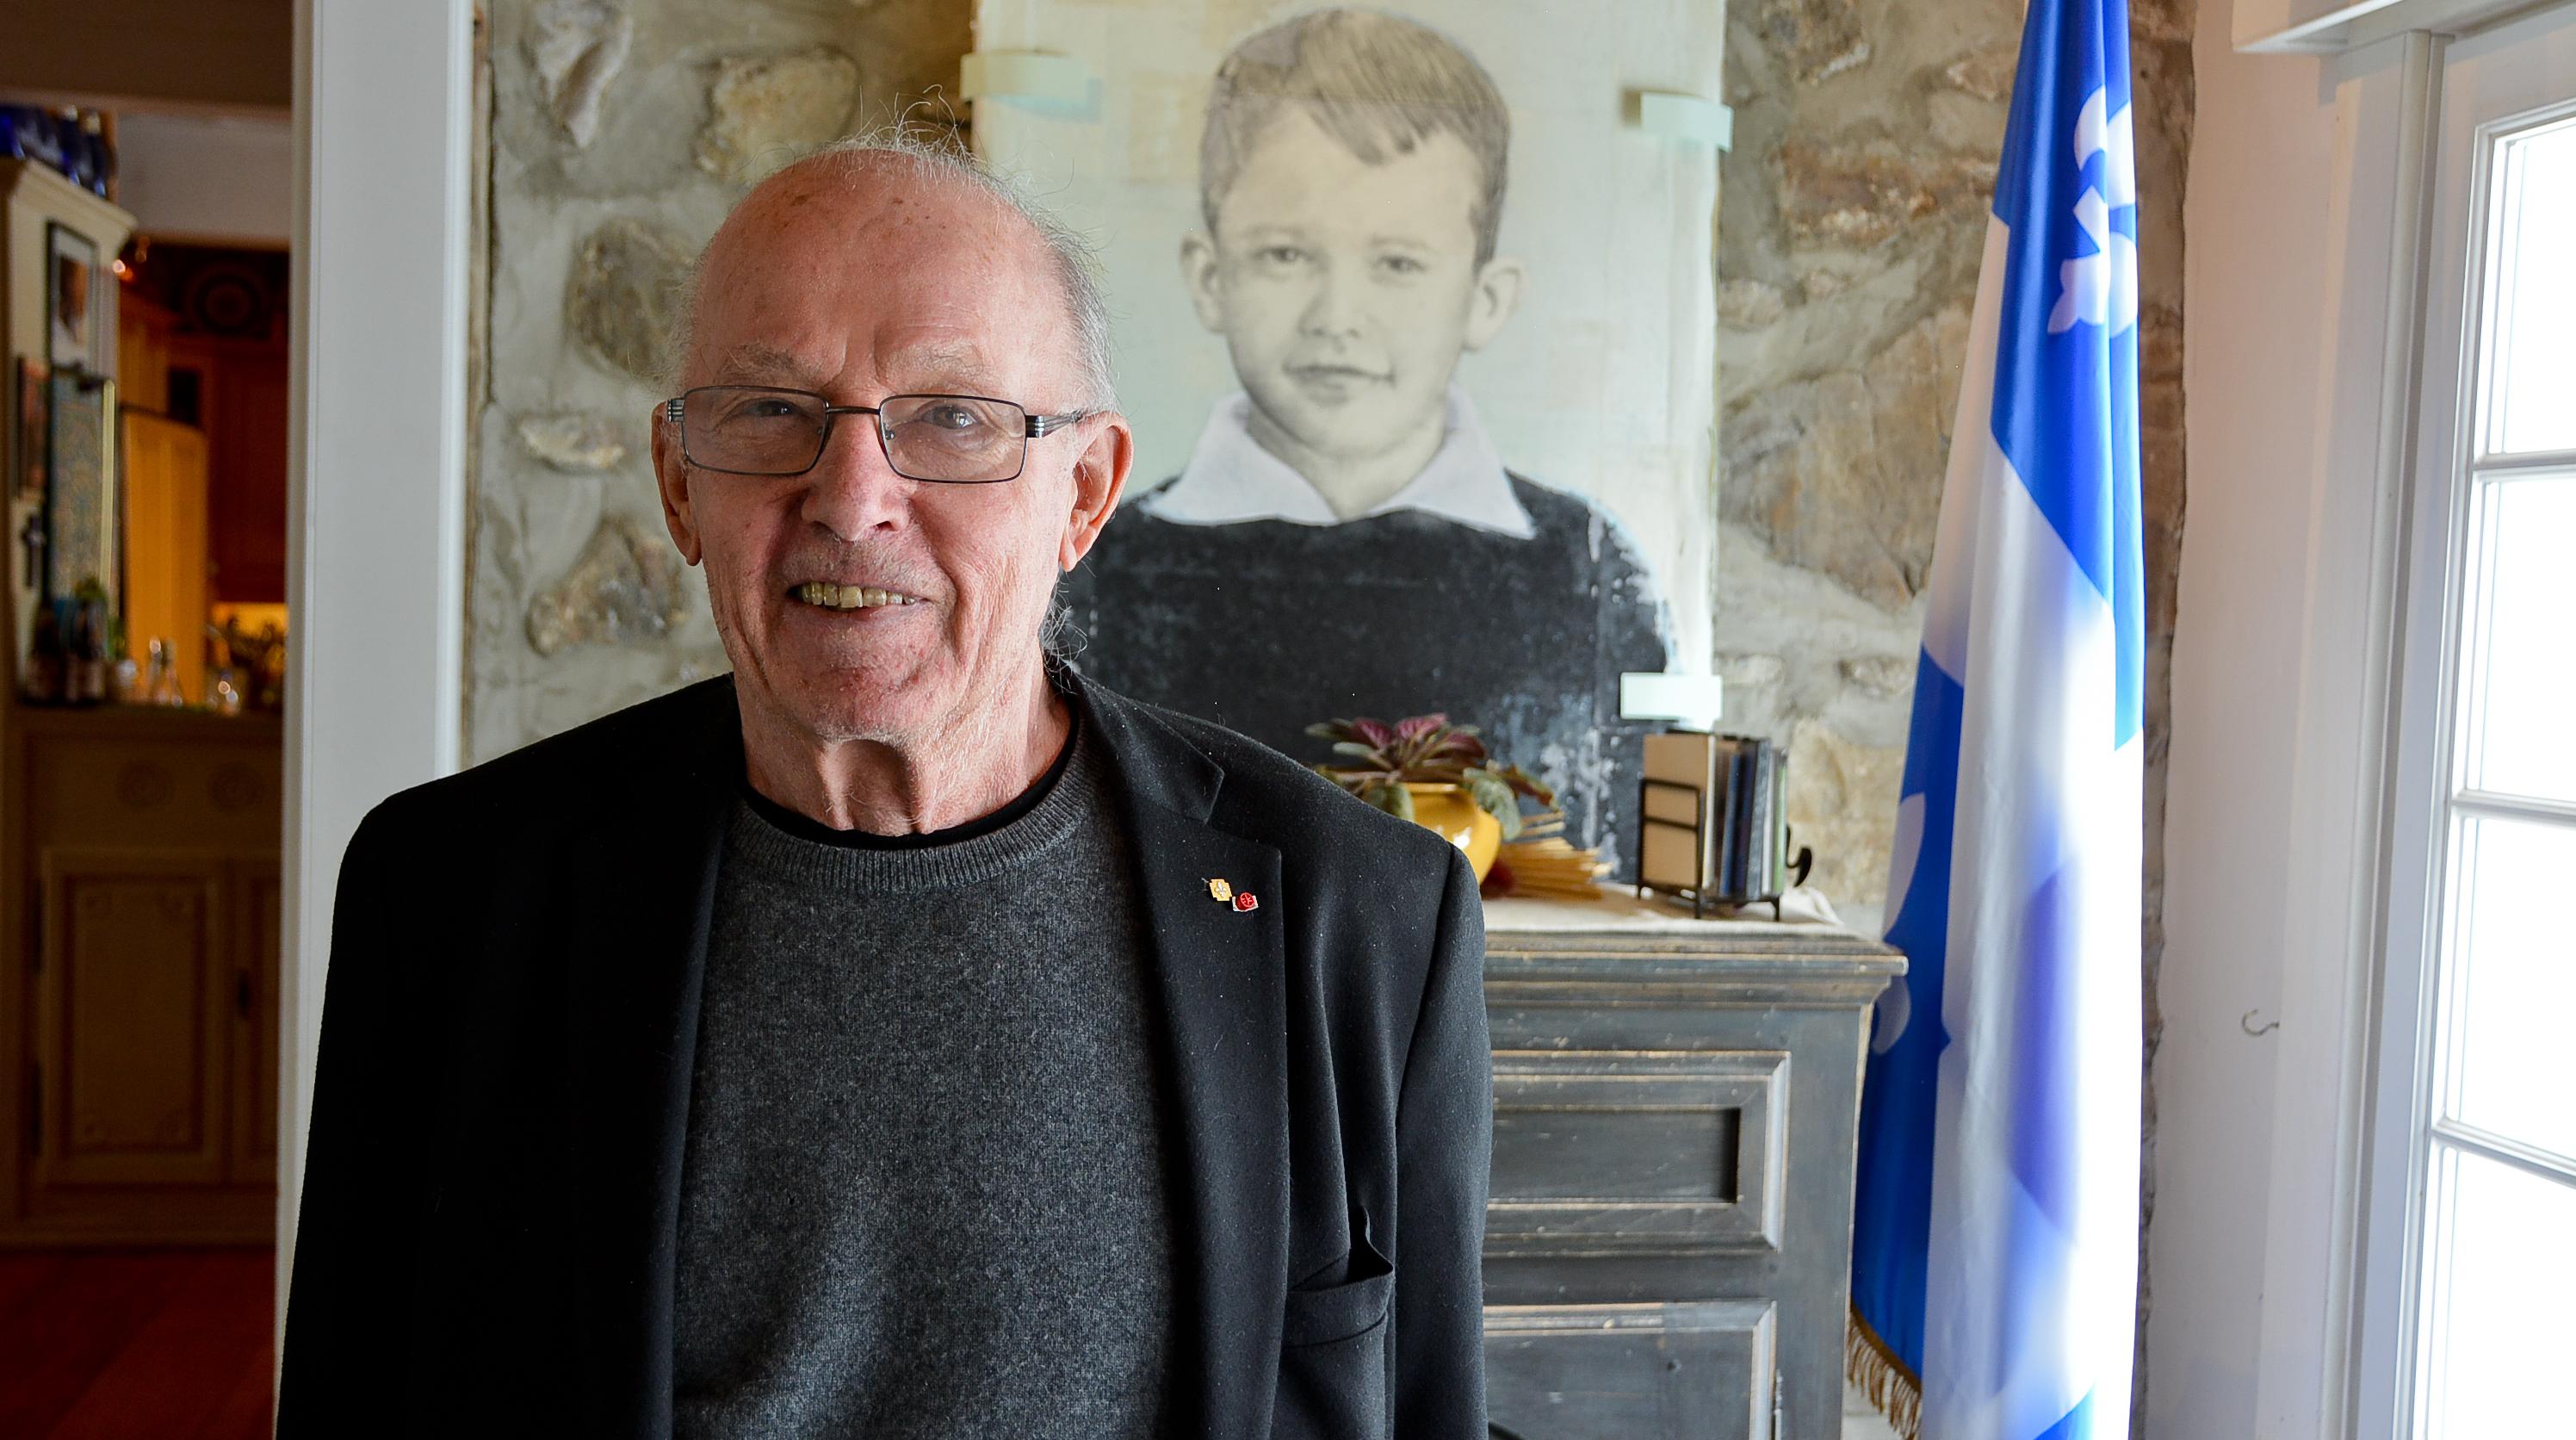 Conversation avec... Bernard Landry, ancien Premier ministre du Québec